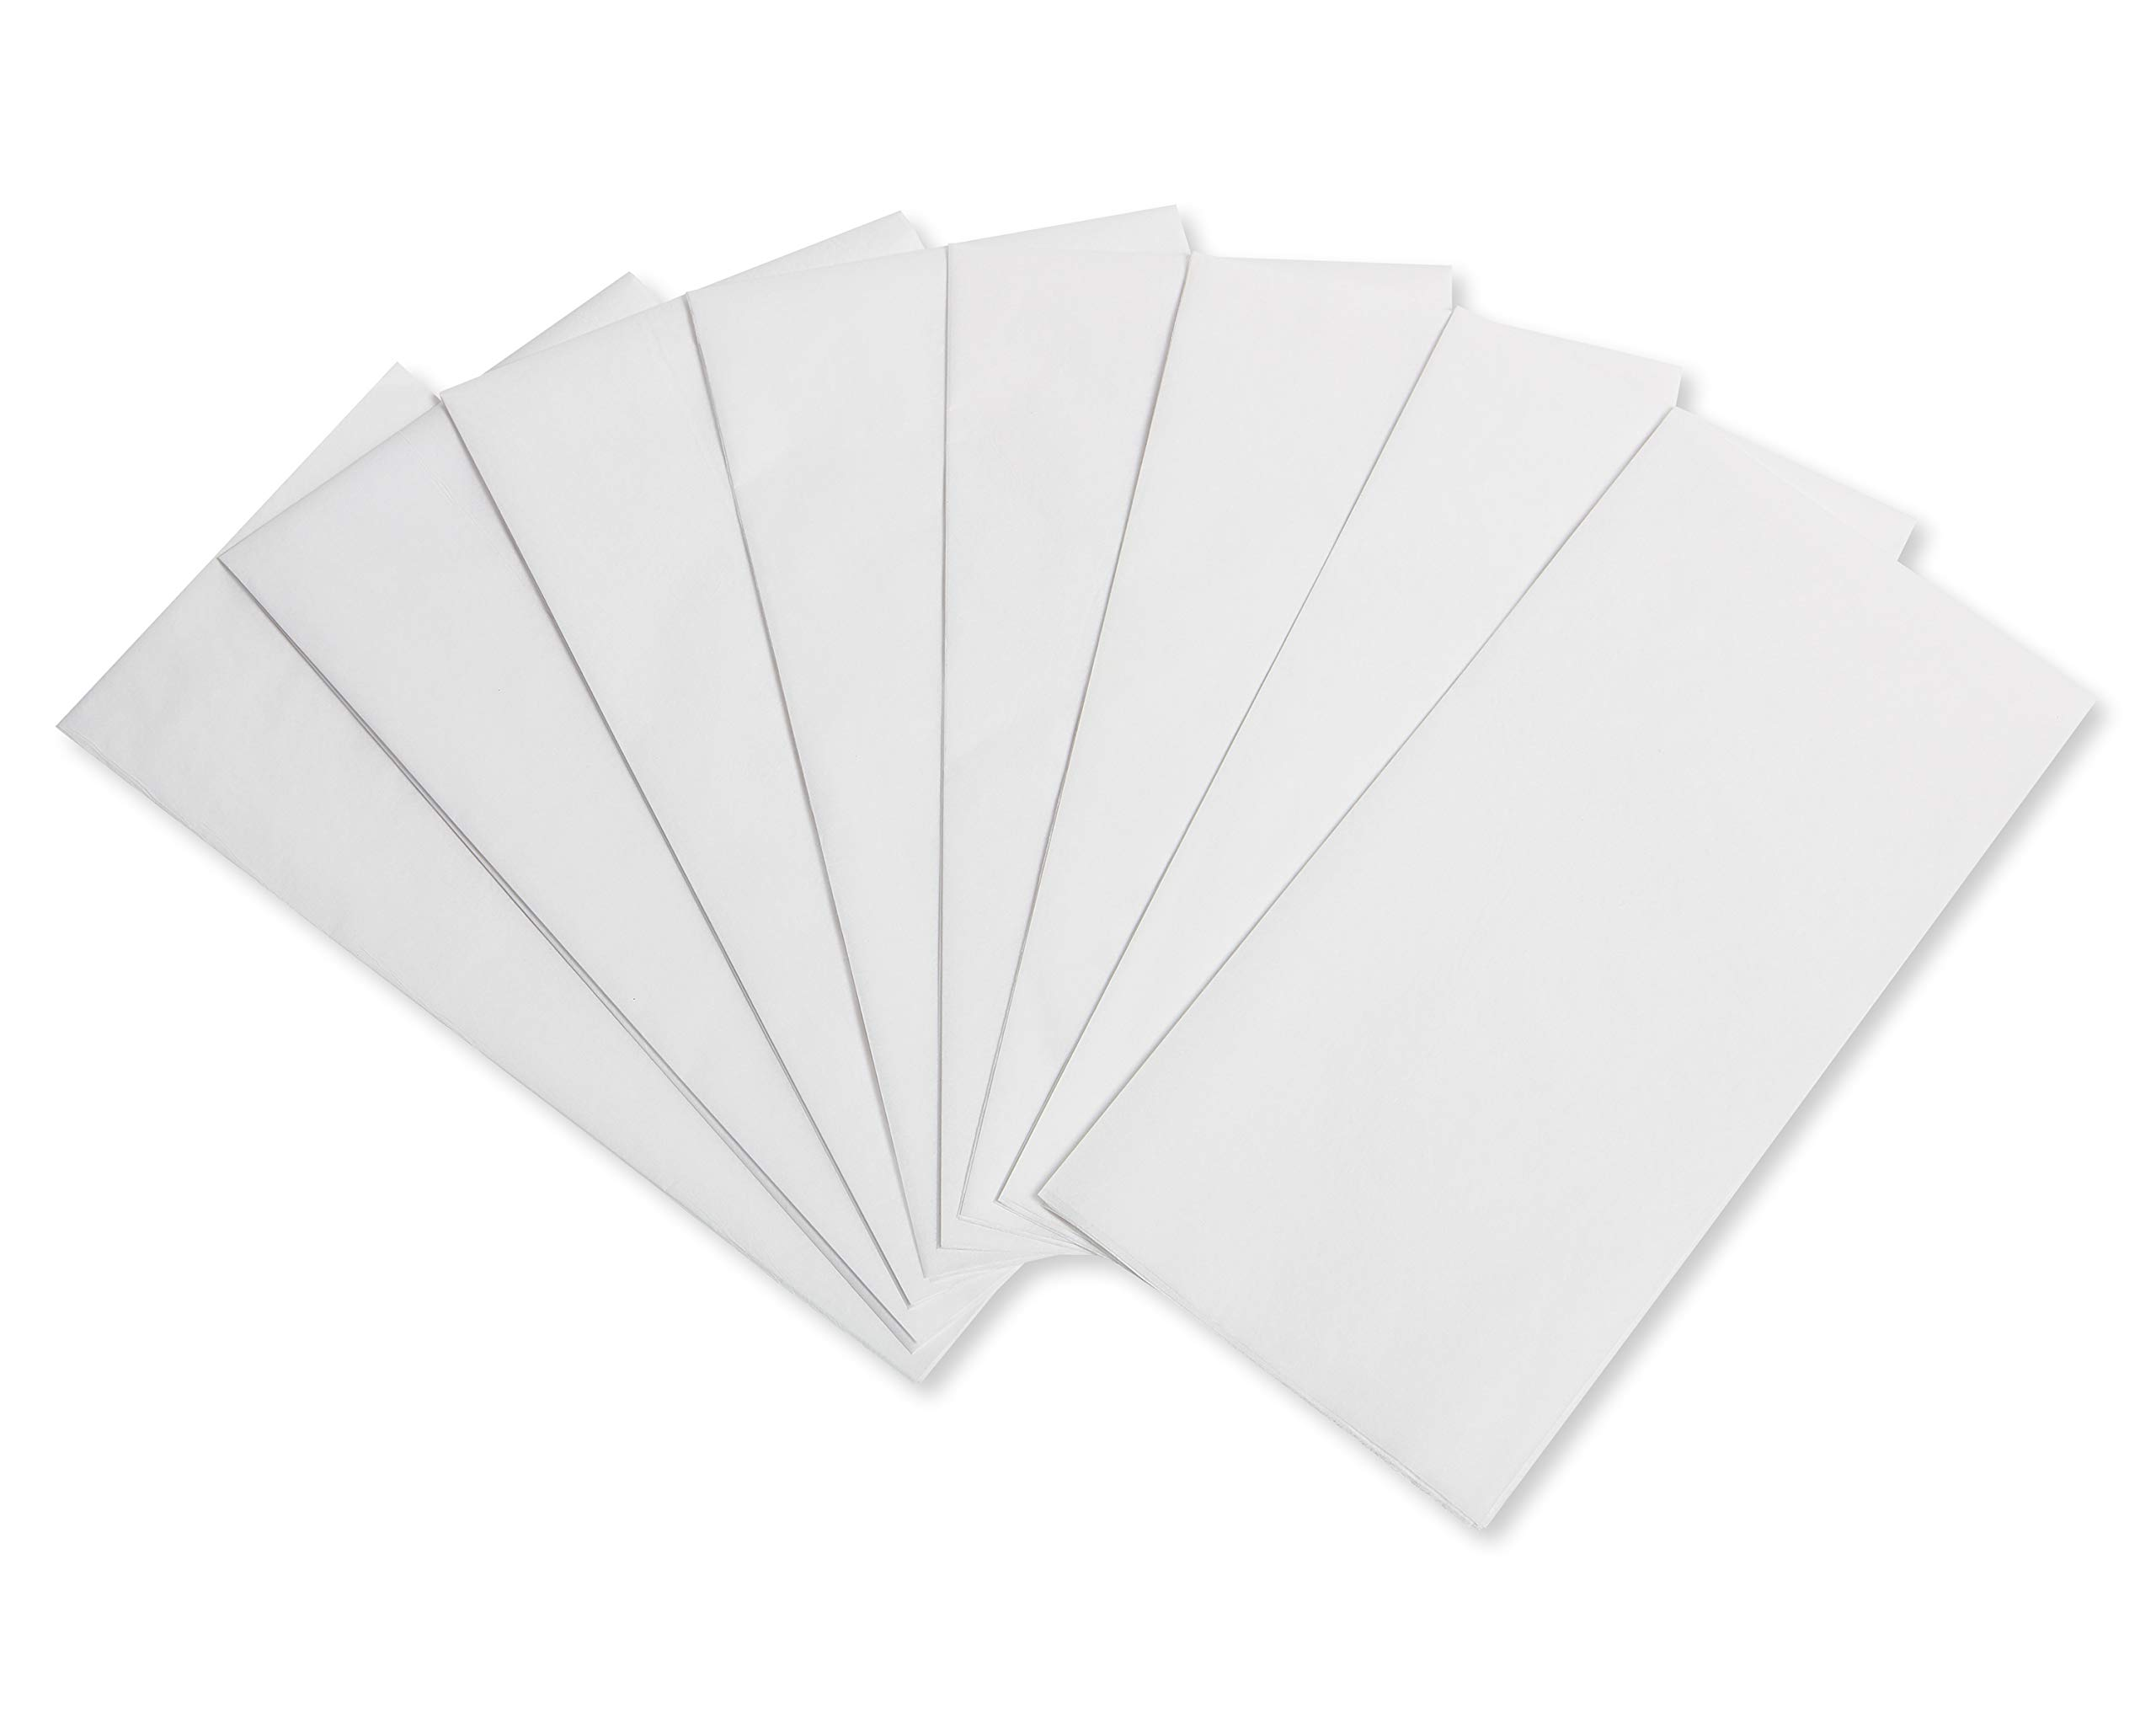 American Greetings Bulk White Tissue Paper (200-Sheets)